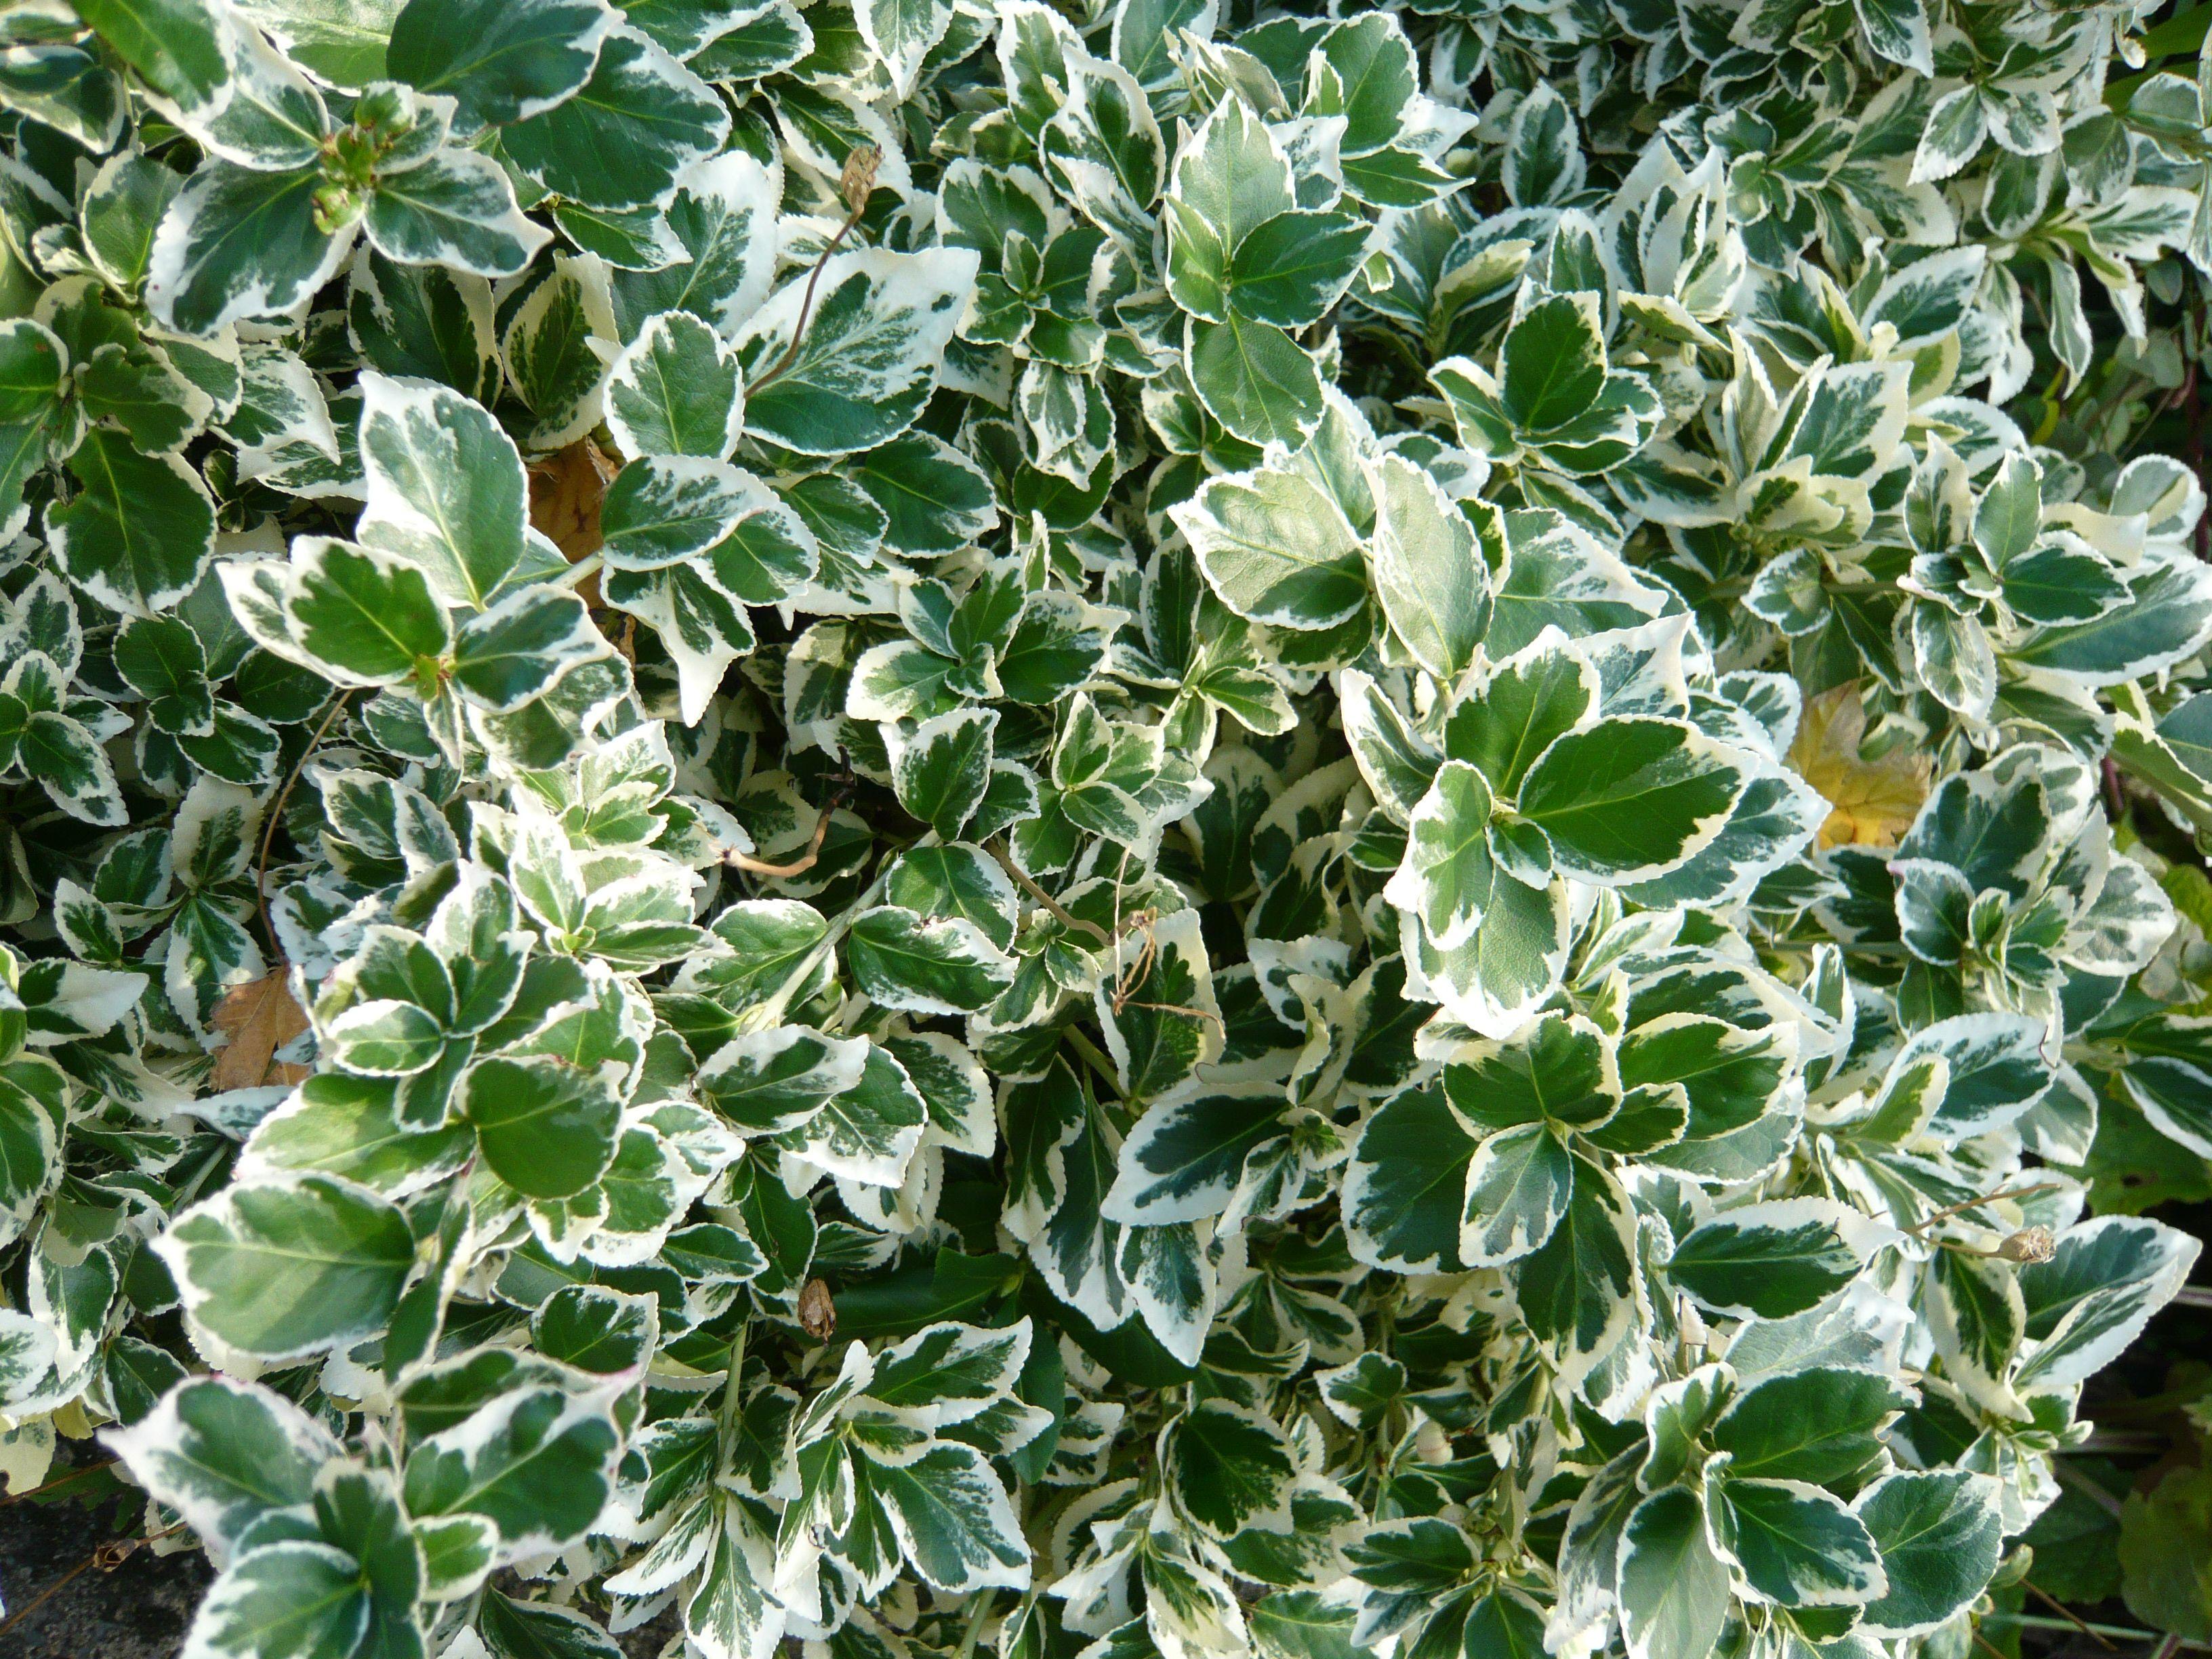 Growing Emerald Gaiety Euonymus